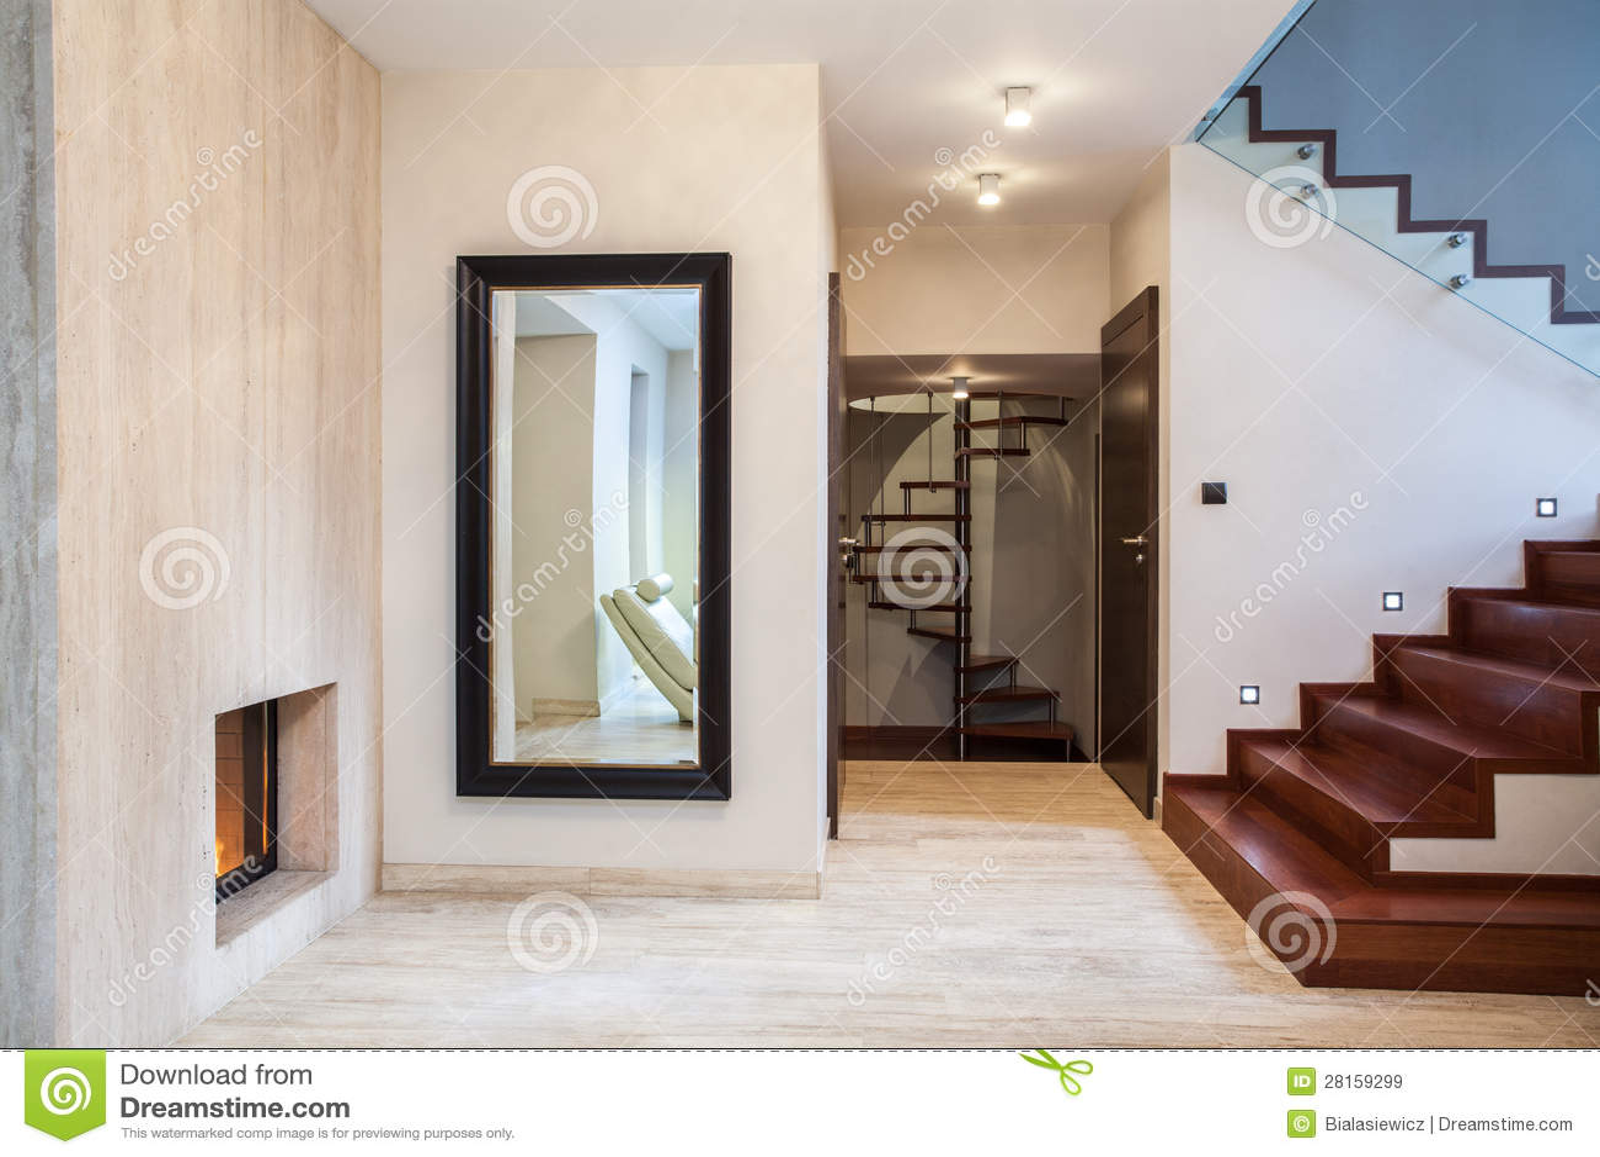 Travertine House: Mirror And Stairs Stock Image